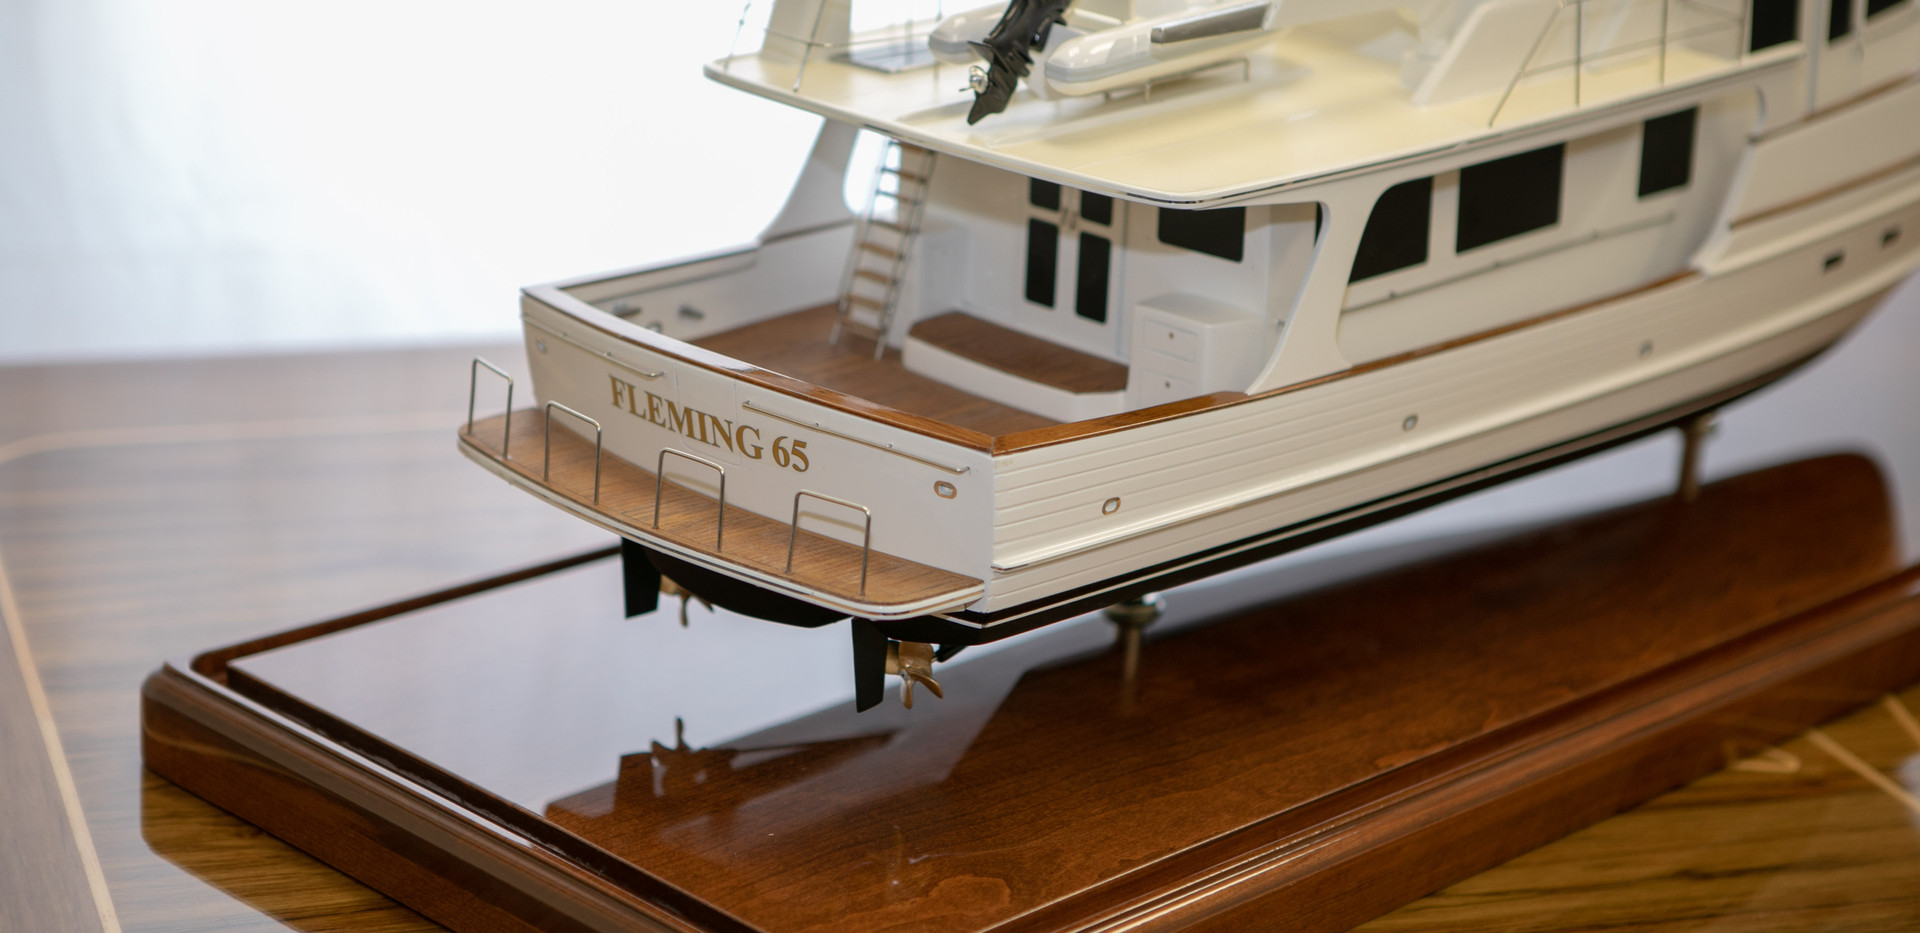 NewportBoatModels-Fleming65Full-3.jpg